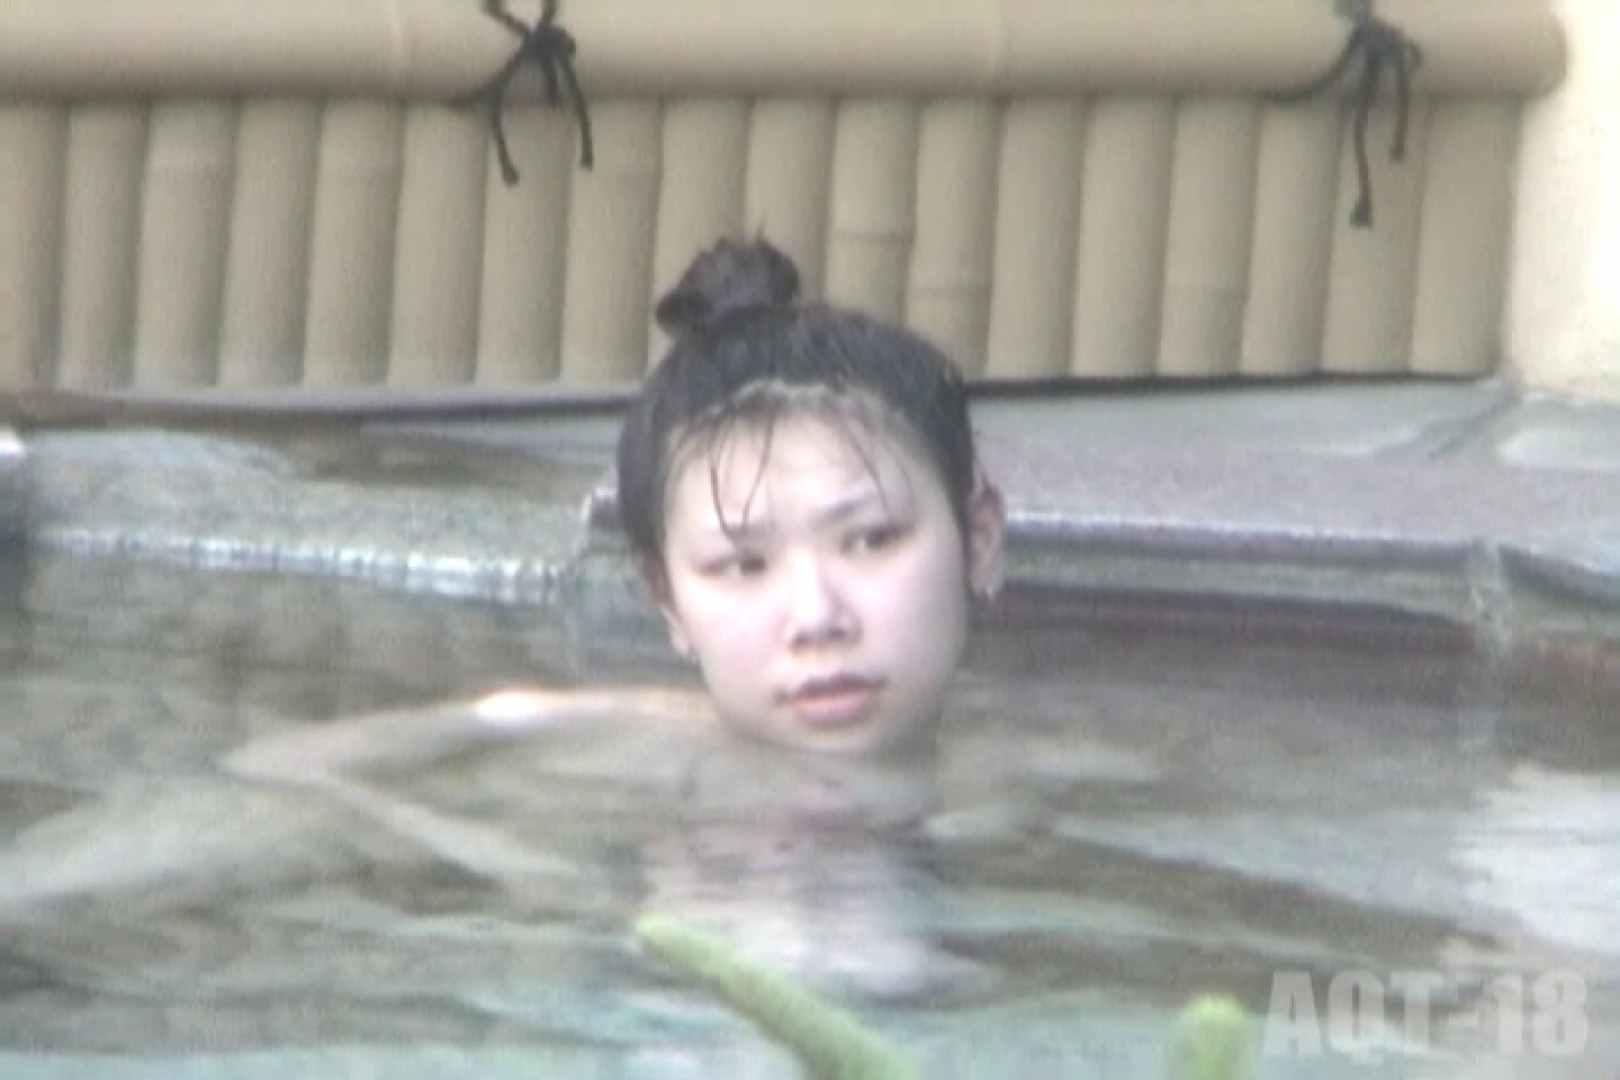 Aquaな露天風呂Vol.855 露天風呂編 | 盗撮シリーズ  86PIX 55